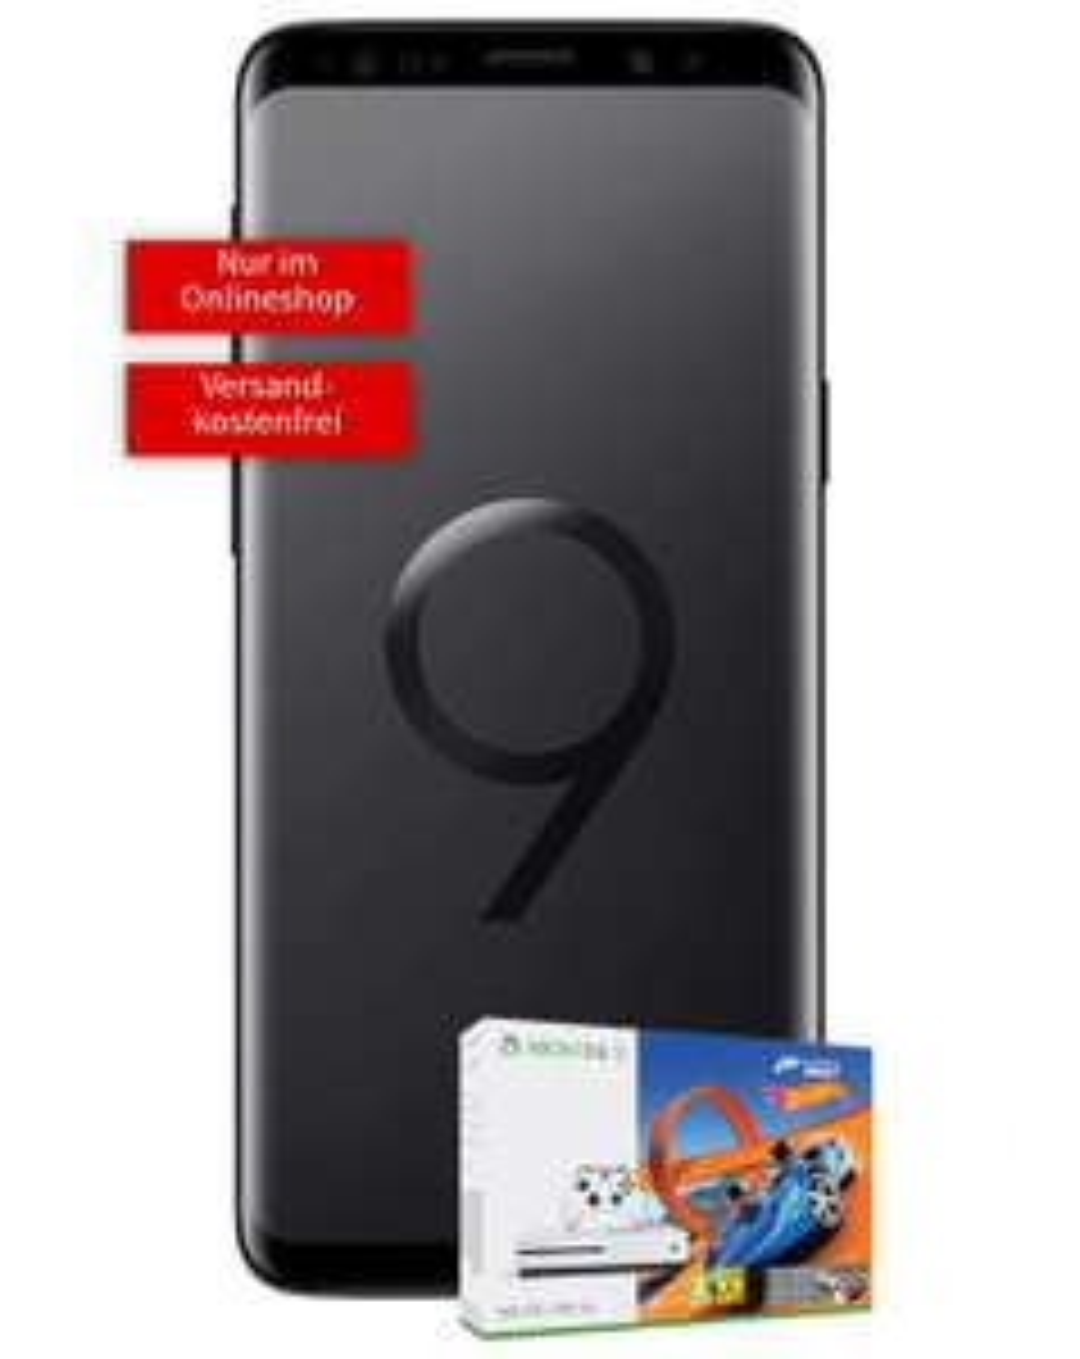 SamsungGalaxy S9+ Dual-SIM& Microsoft Xbox One S 500GB Konsole - Forza Horizon 3 + Hot Wheels Bundle weiß